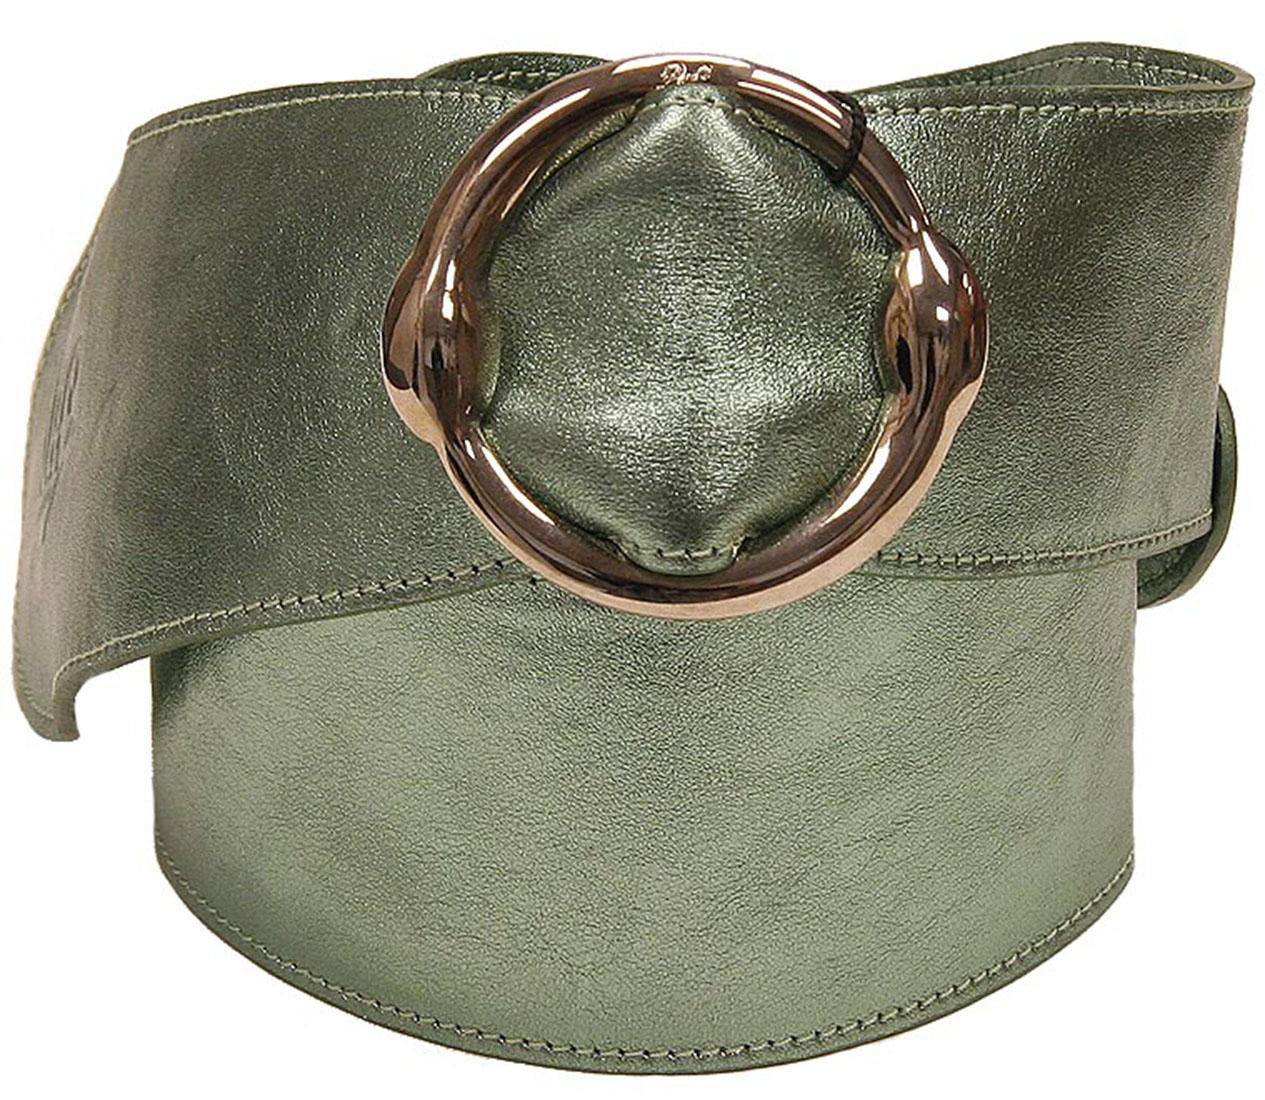 DG Womens Belt Silver Green Leather